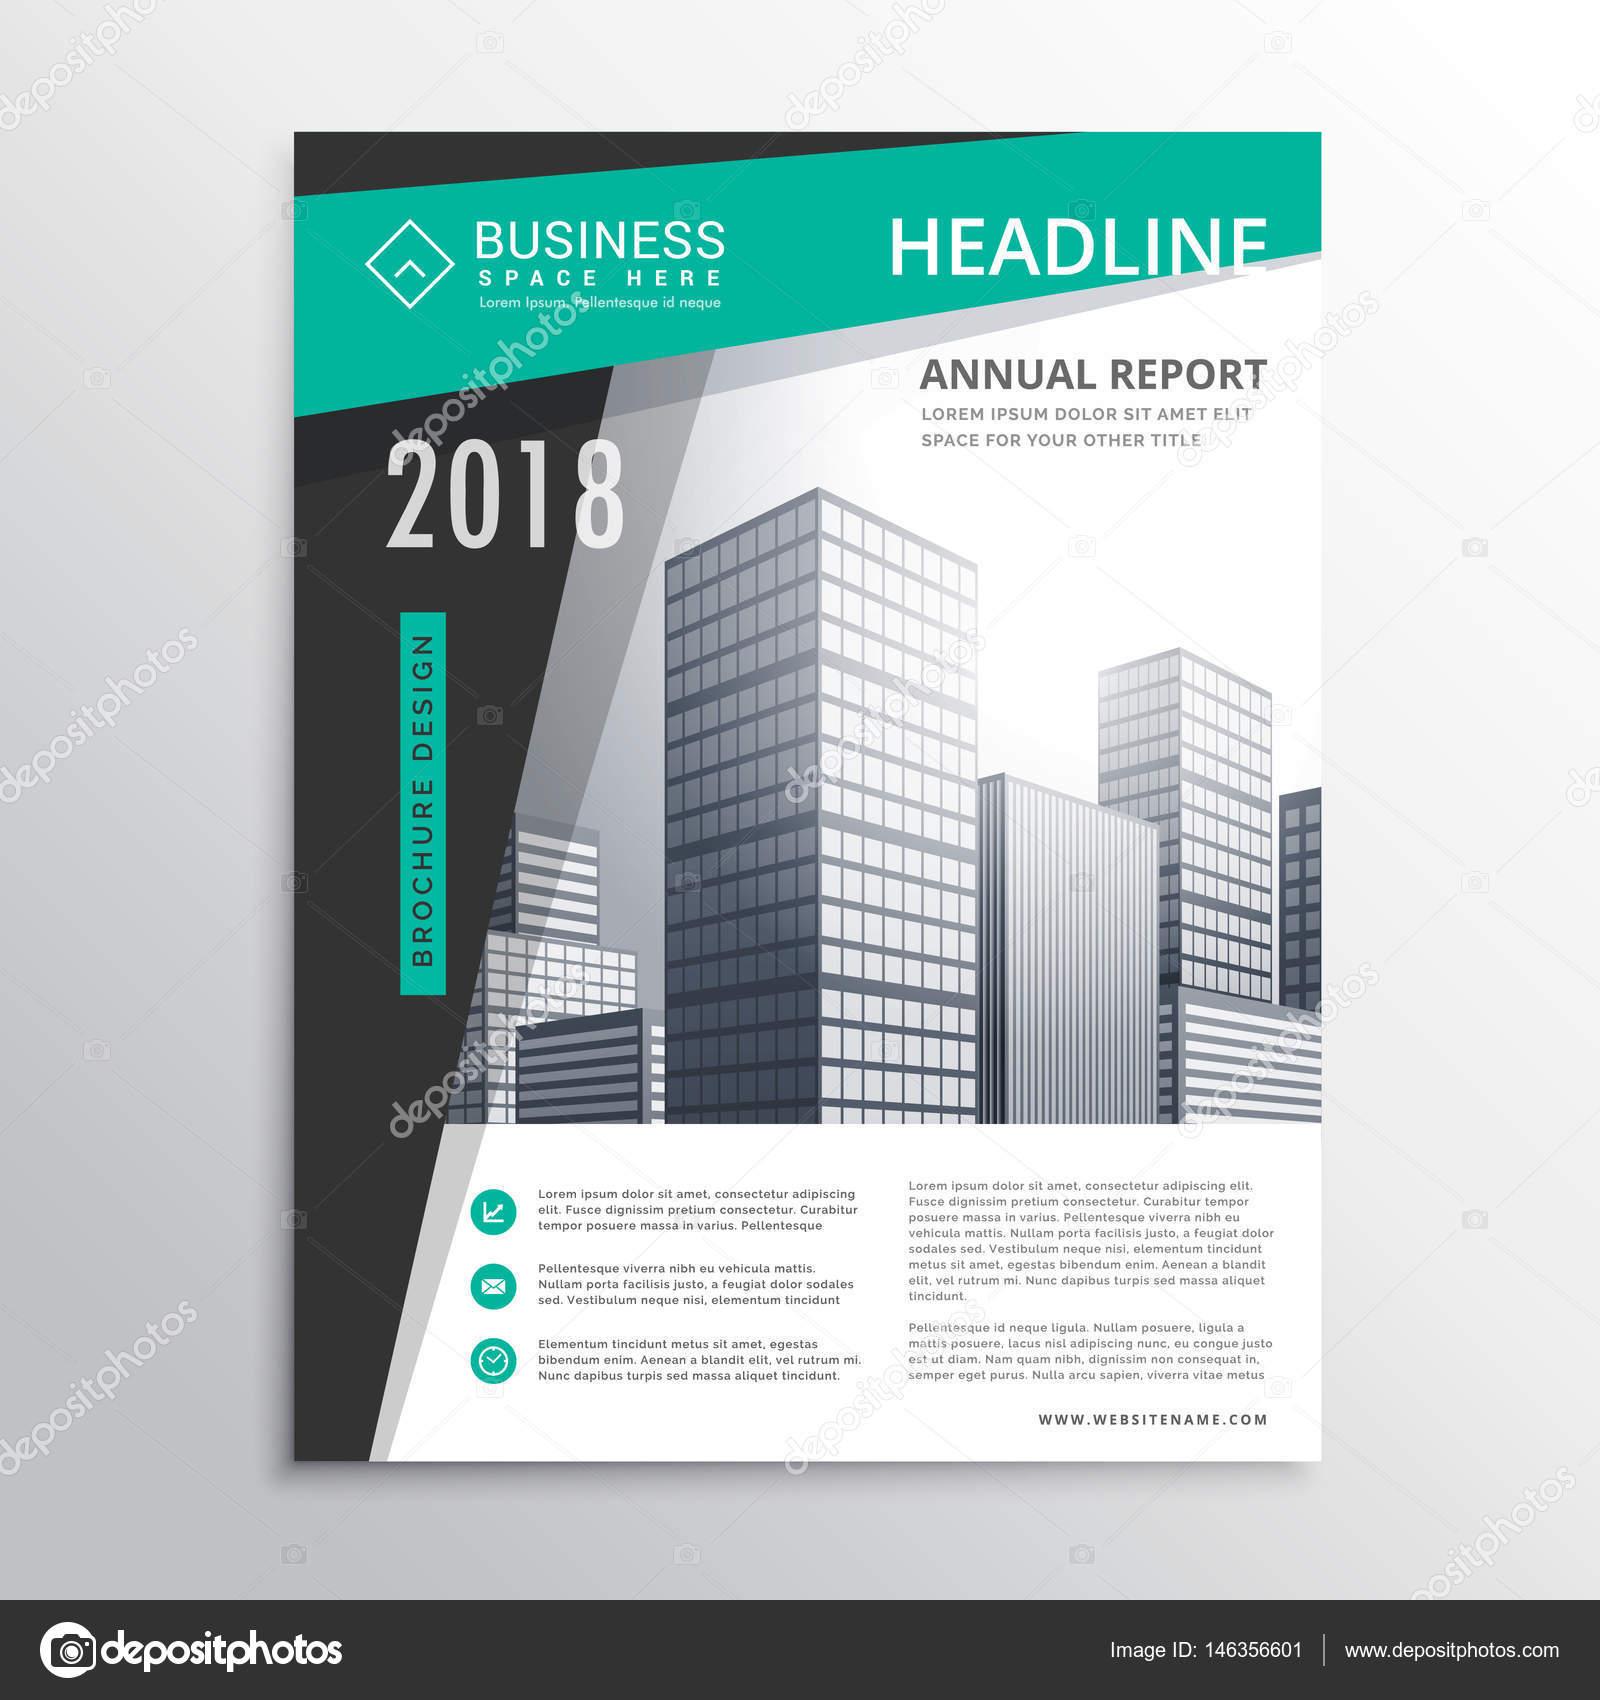 Awesome business brochure flyer design template design